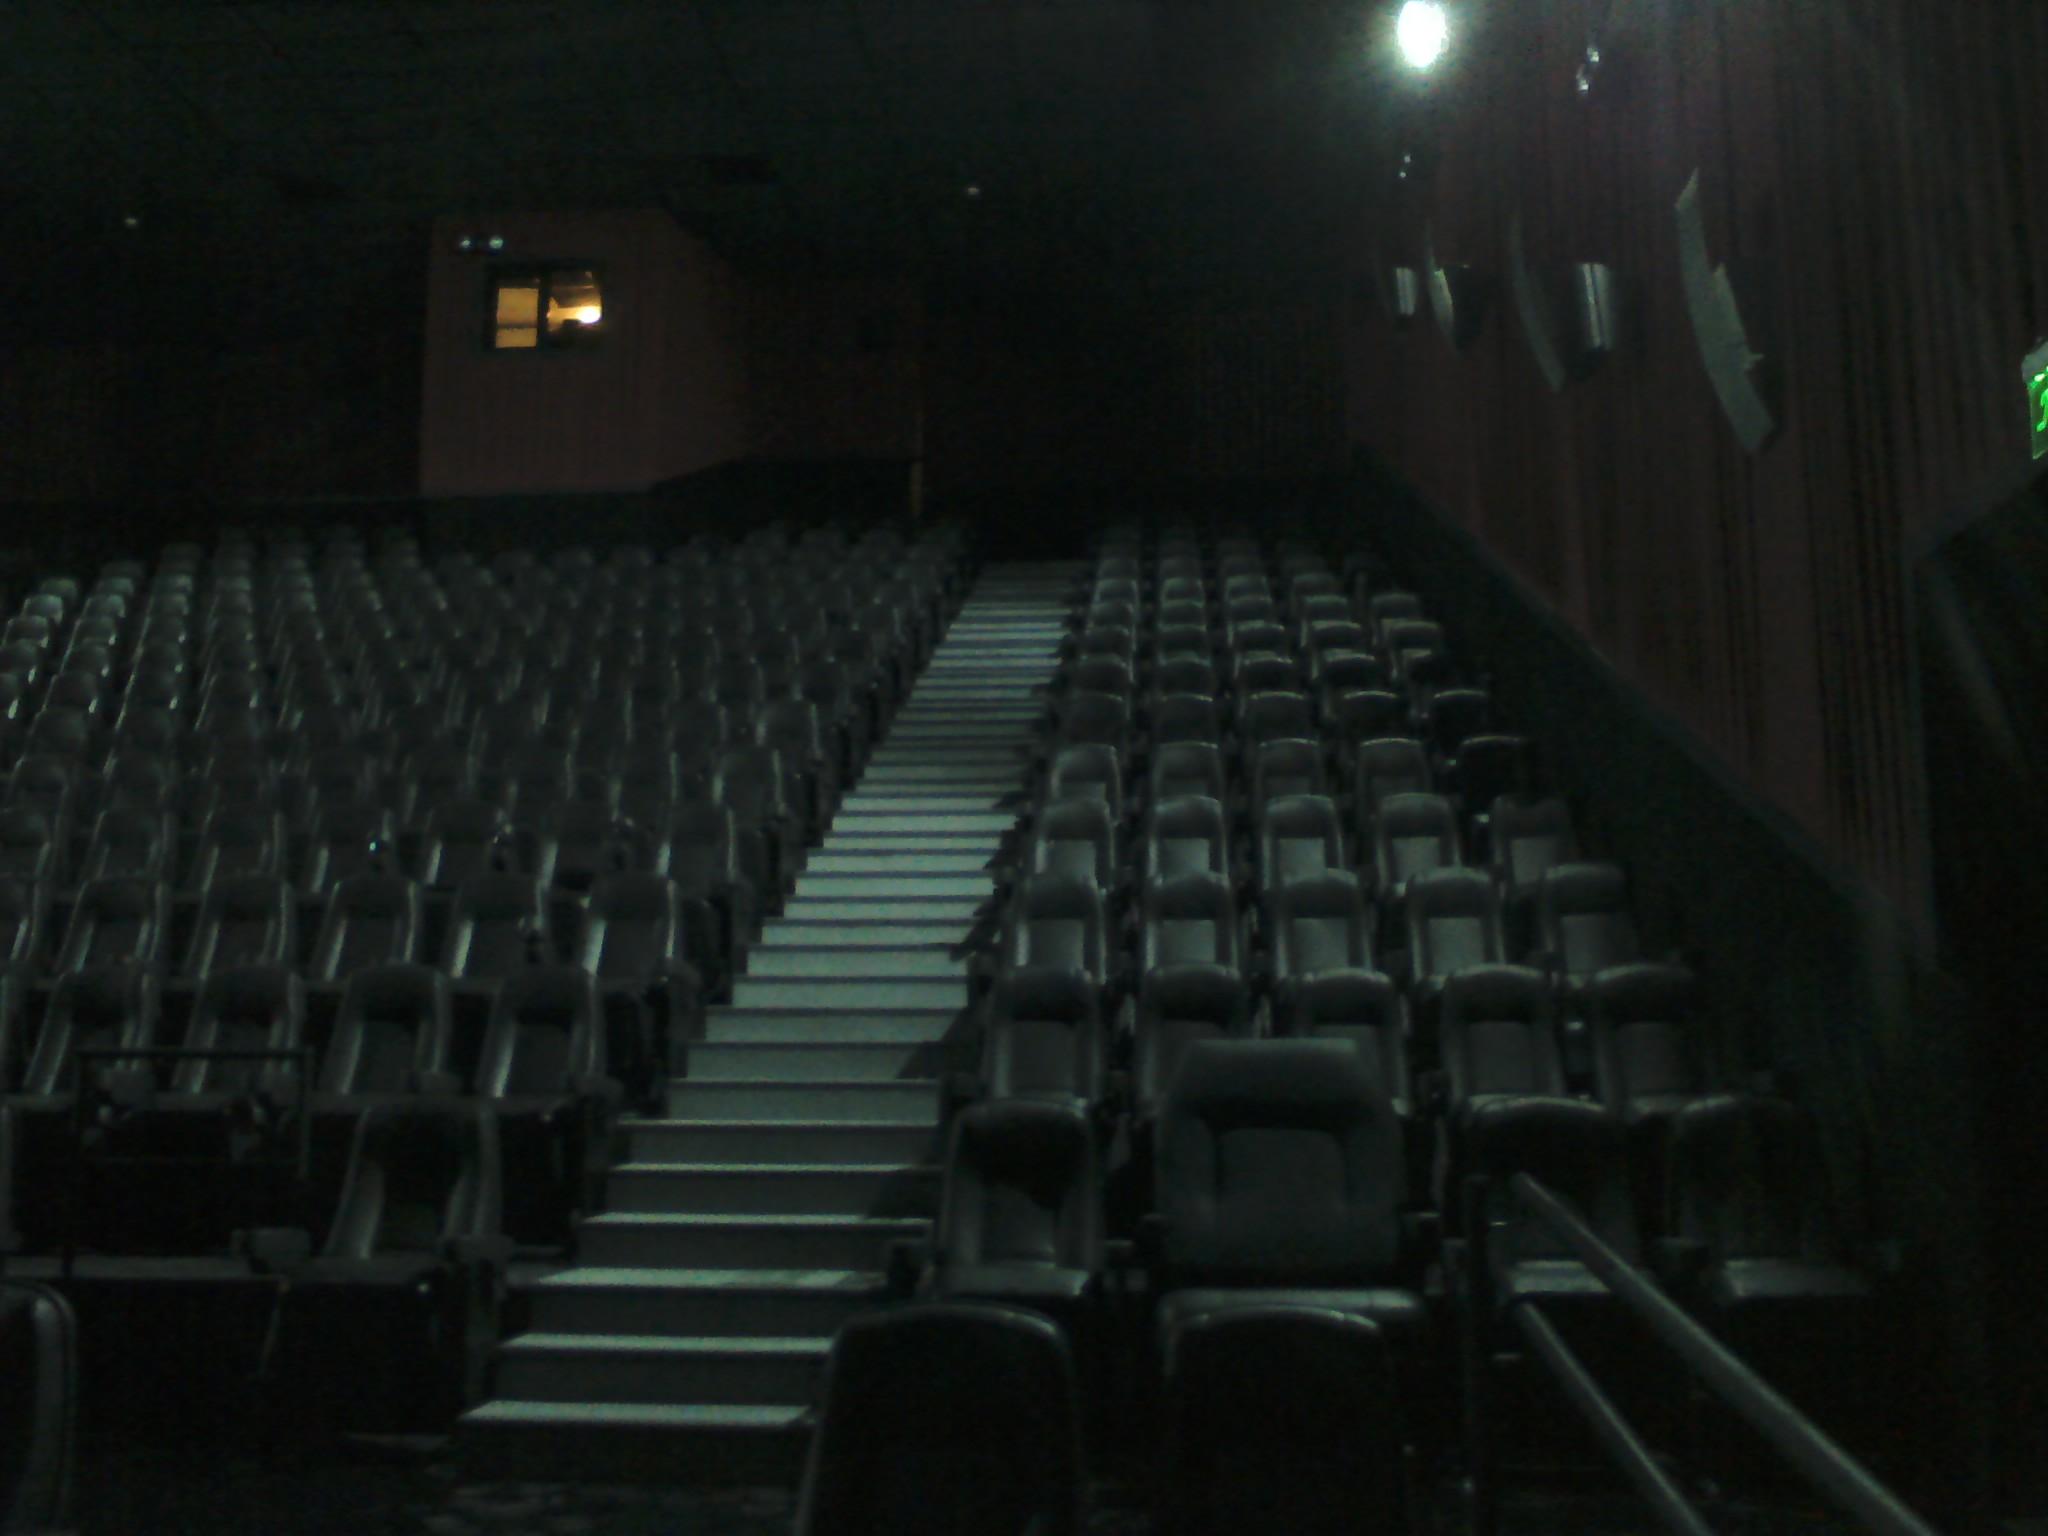 DOBILIA SA Construcciones - Cinemark Santa Fe - Sala 7 3D - 3